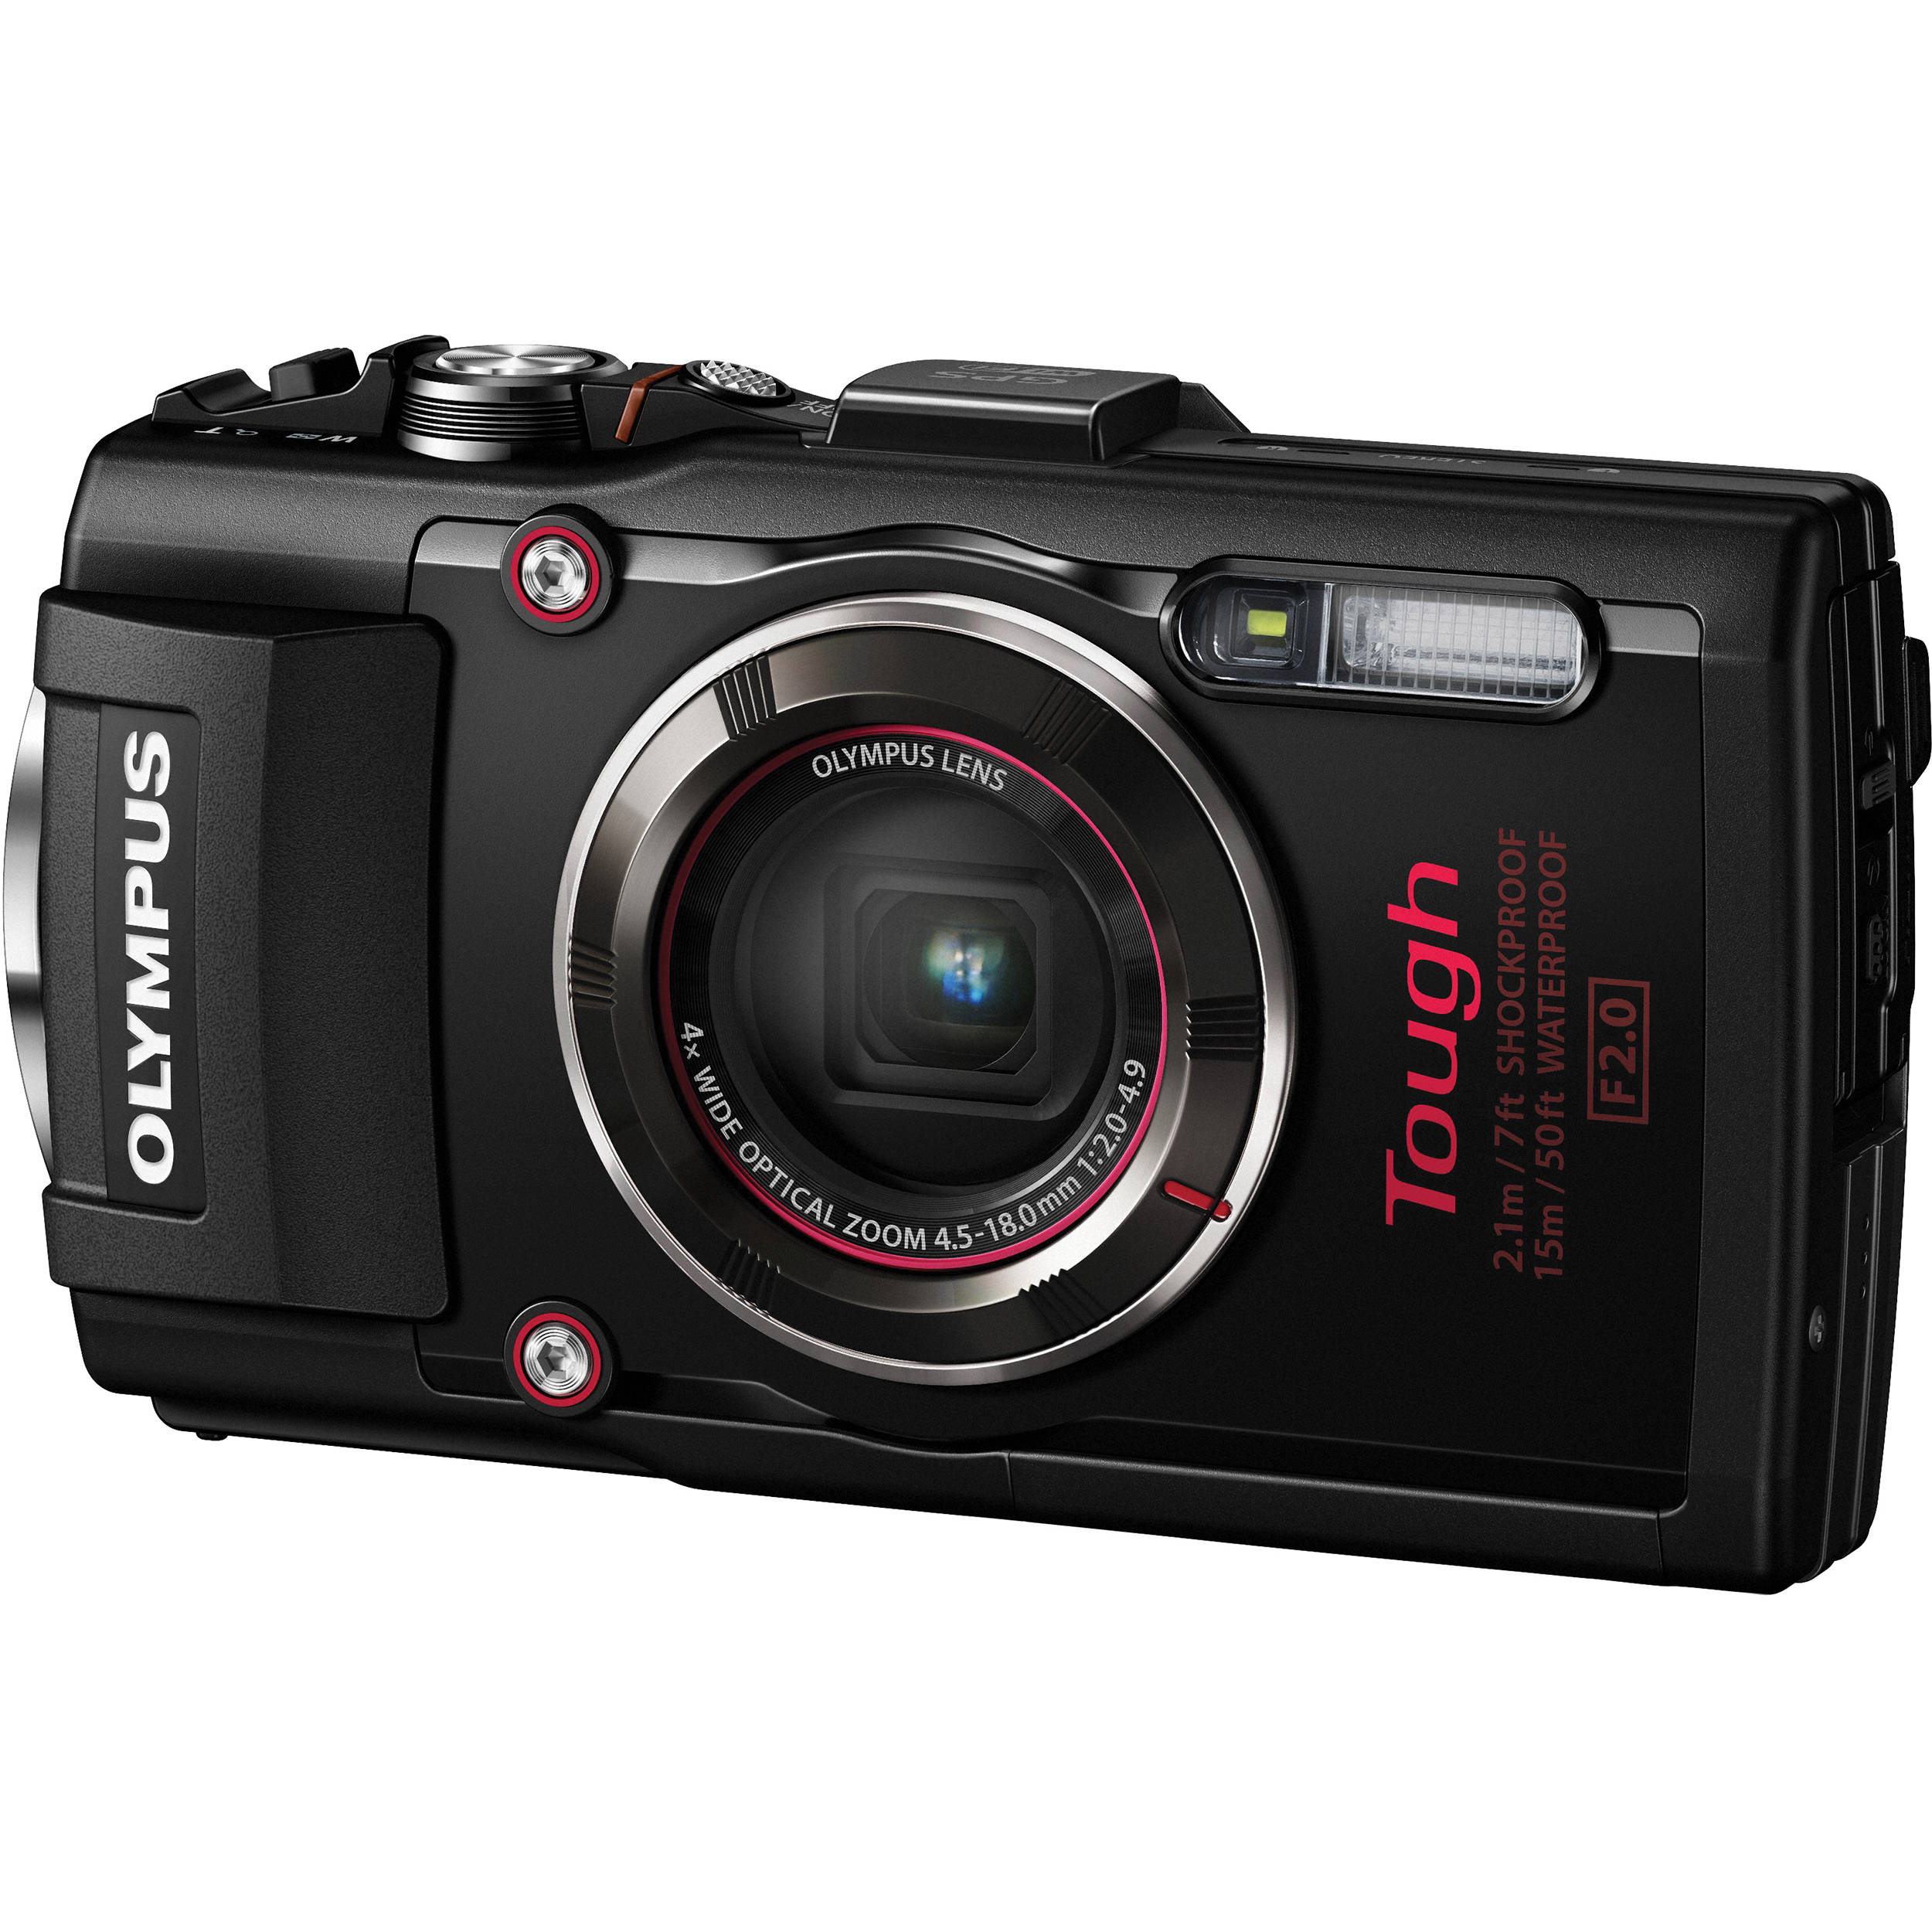 olympus stylus tough tg 4 digital camera black v104160bu000